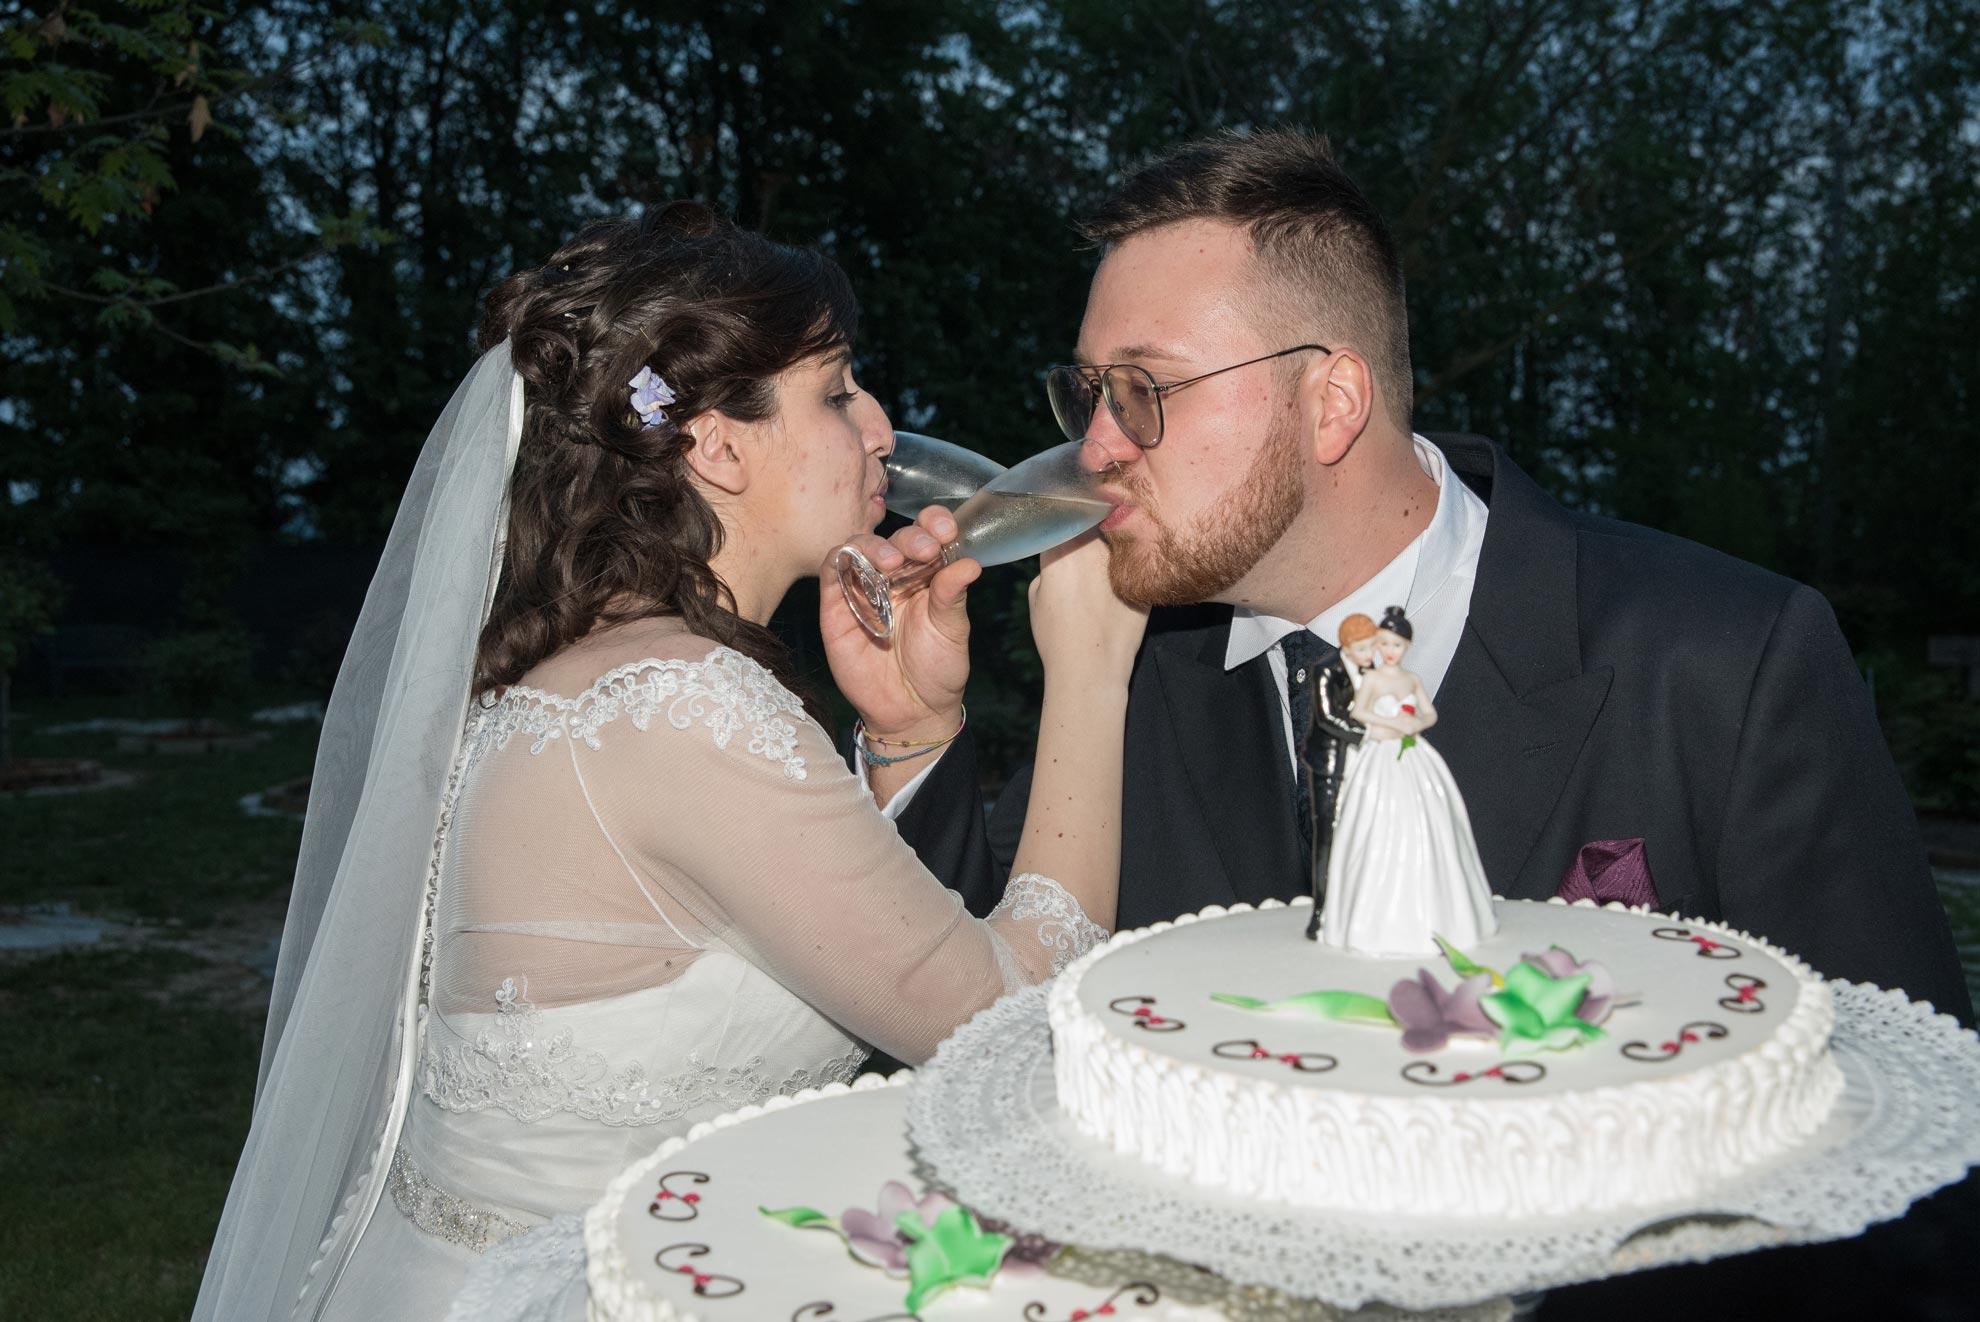 Matrimonio a Narzole Lorenza Diego - DSC 3412 - Fotografie matrimonio brindisi - Fotografie matrimonio brindisi